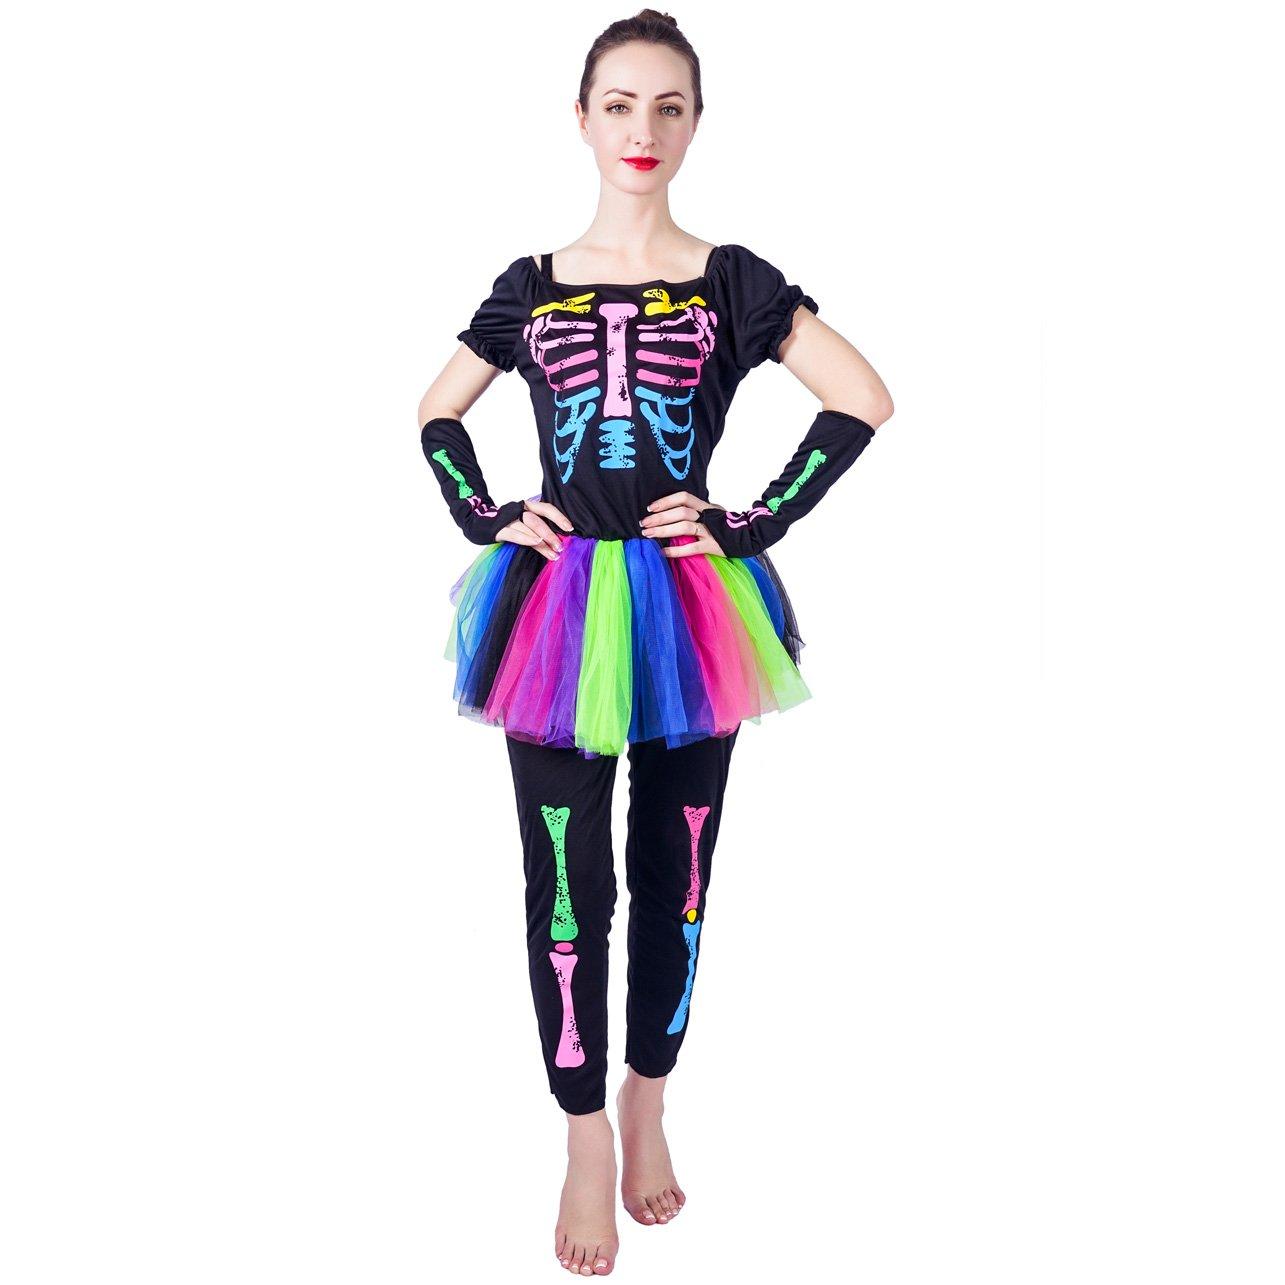 54d8a3e191 Flatwhite womens colorful skeleton costumes clothing jpg 1285x1285 Womens  skeleton